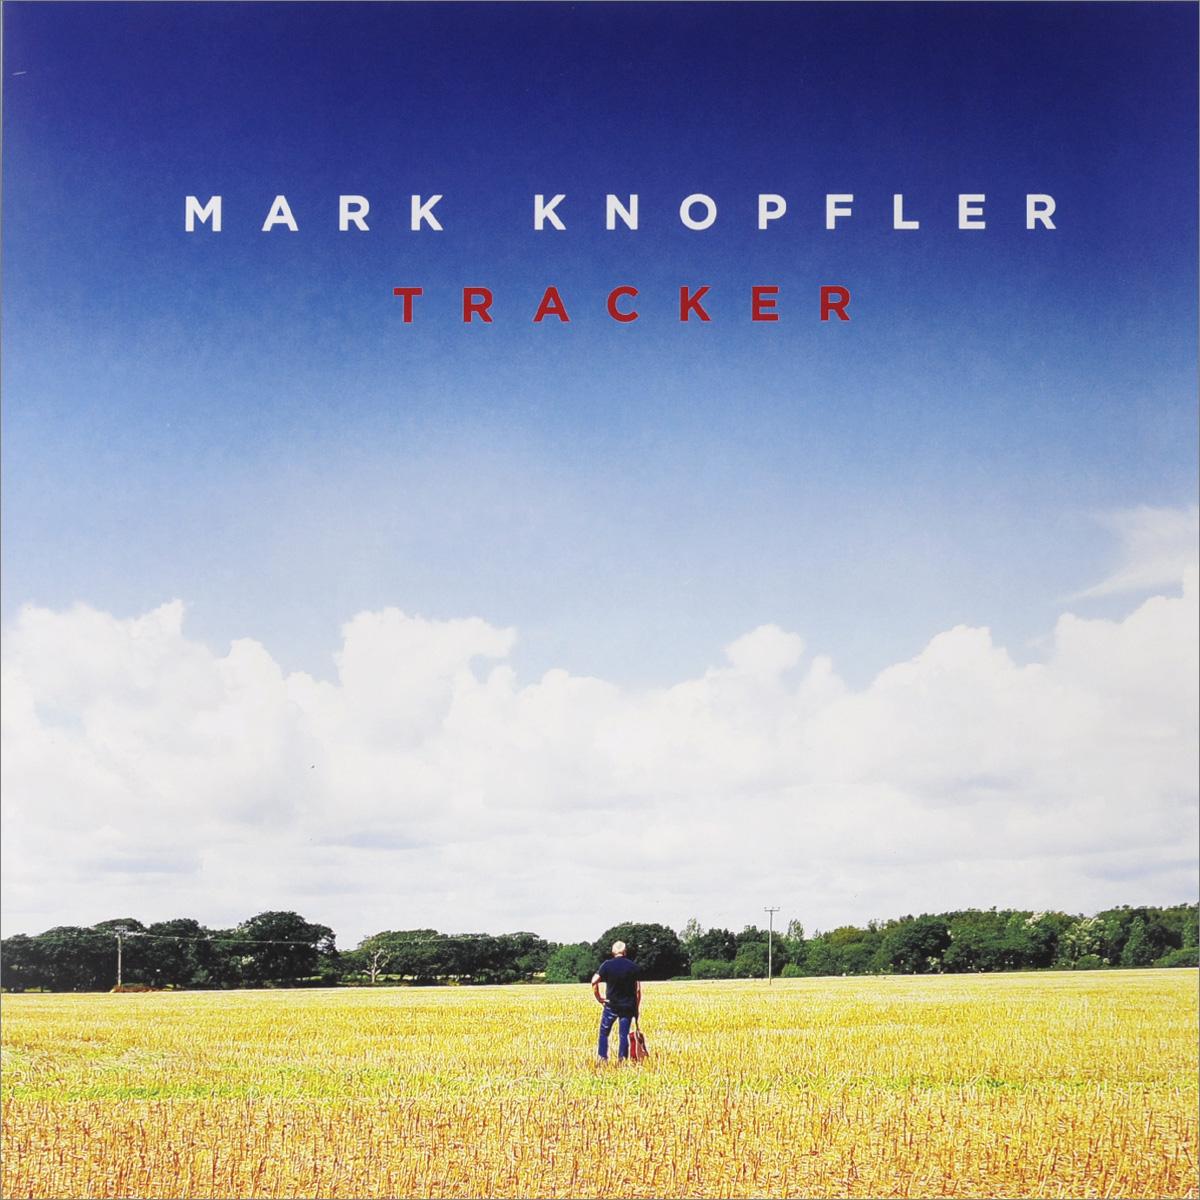 Марк Нопфлер Mark Knopfler. Tracker (2 LP) mark knopfler mark knopfler tracker 2 lp